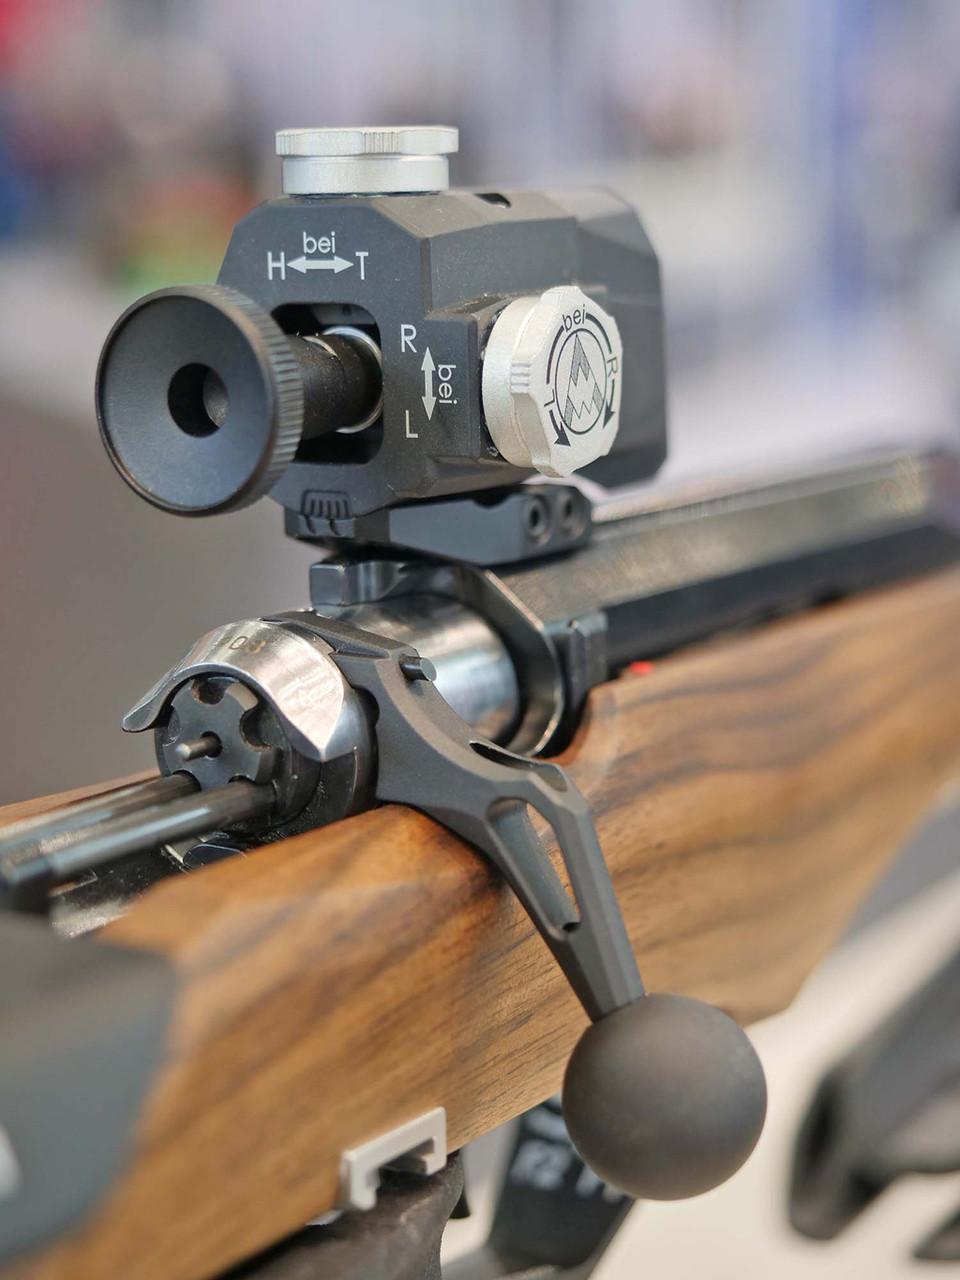 F.W.B Model 2800 W for shooting on a rest (Cal. .22 L.R.) Target Rifle